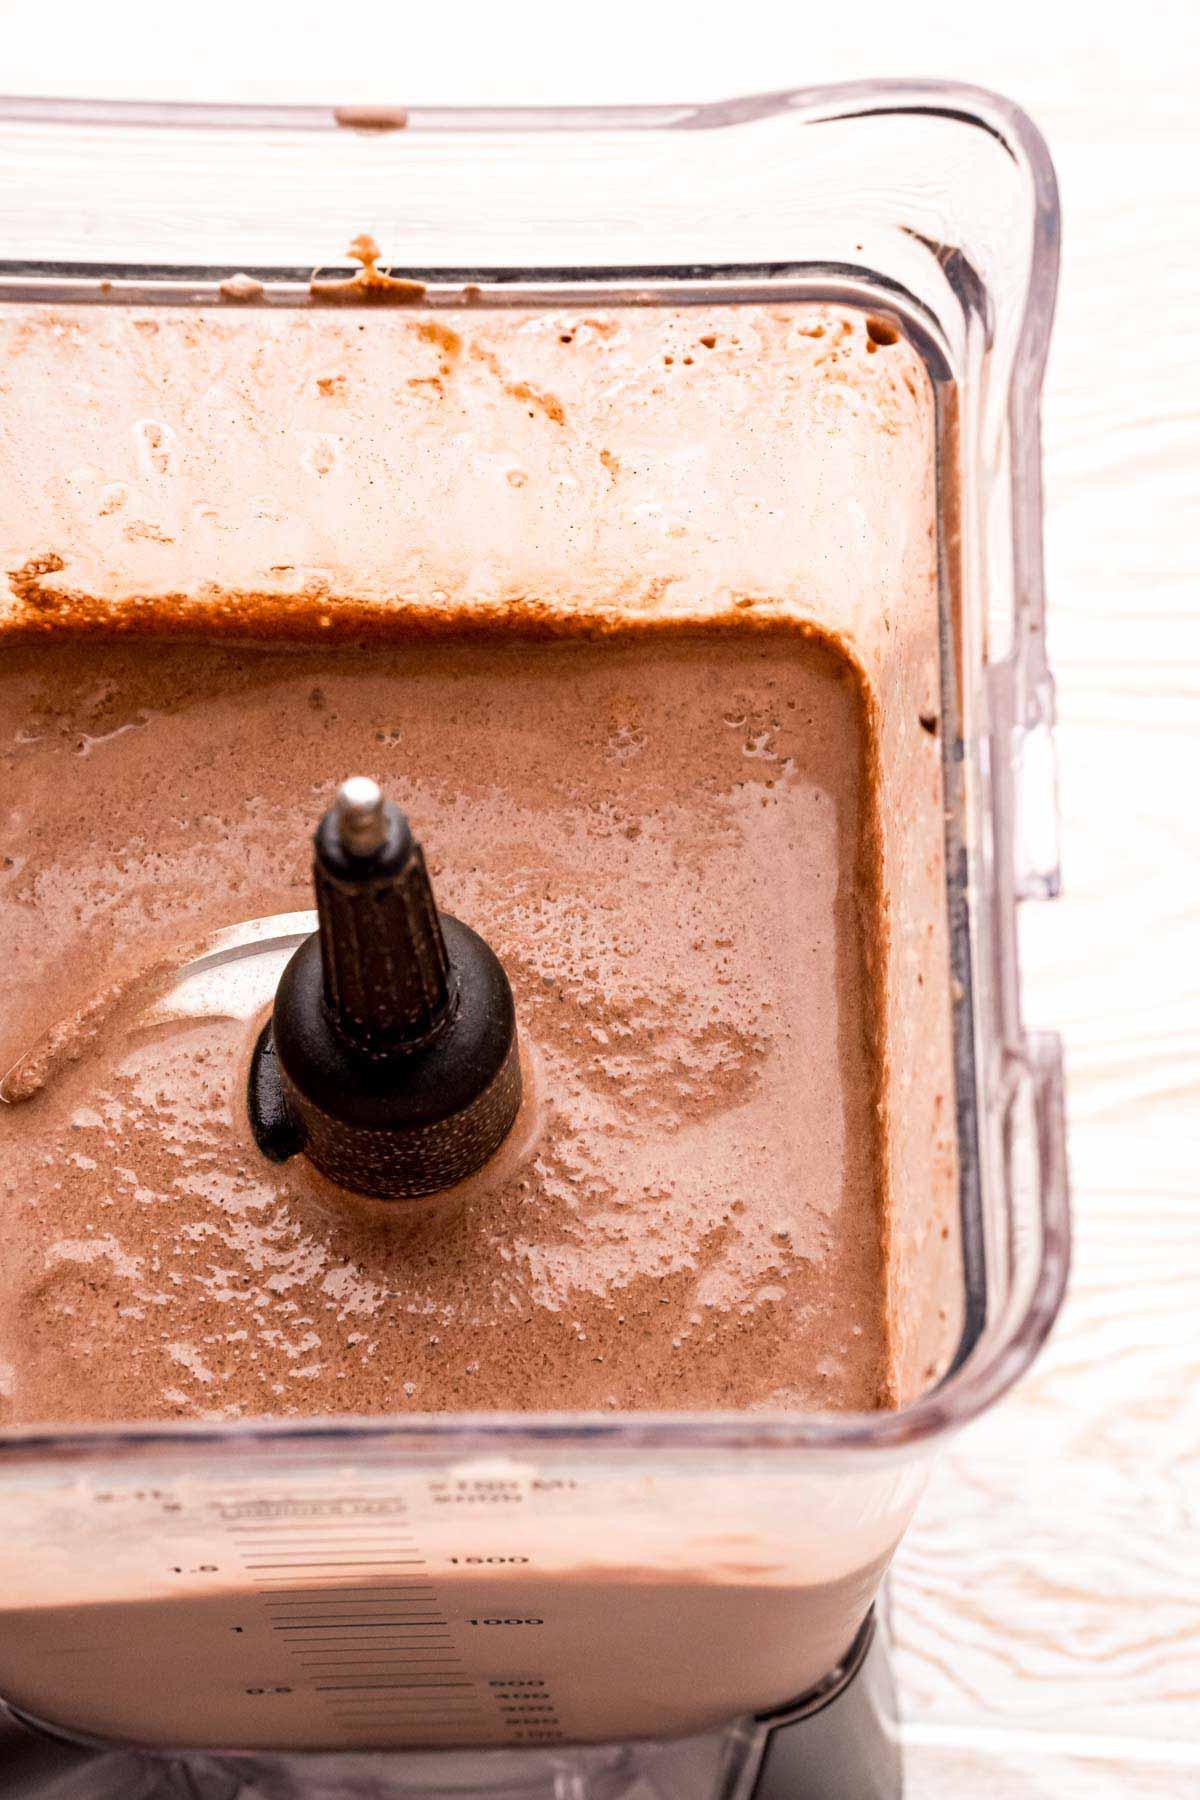 frozen hot chocolate in a blender